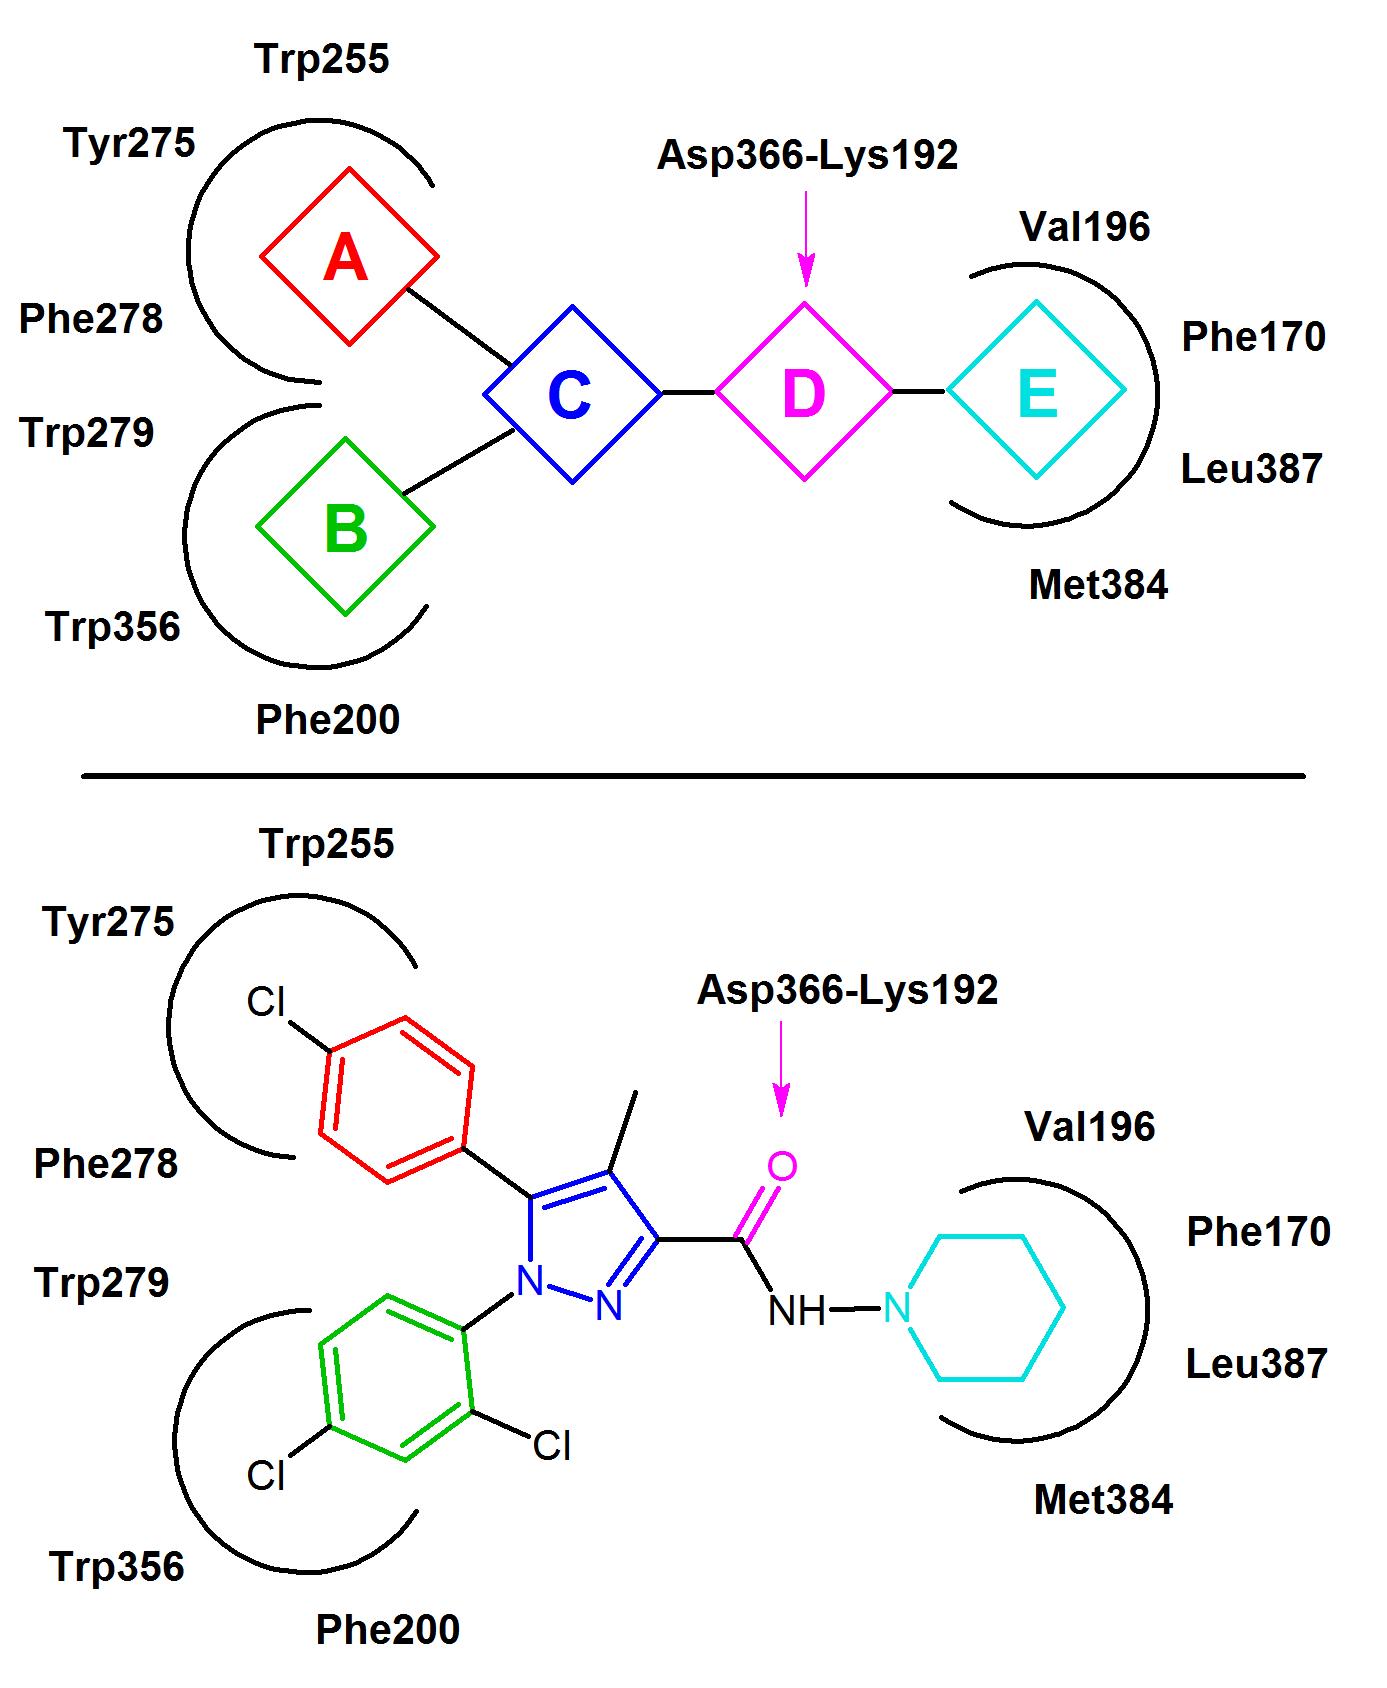 nicotine structure activity relationship of metformin